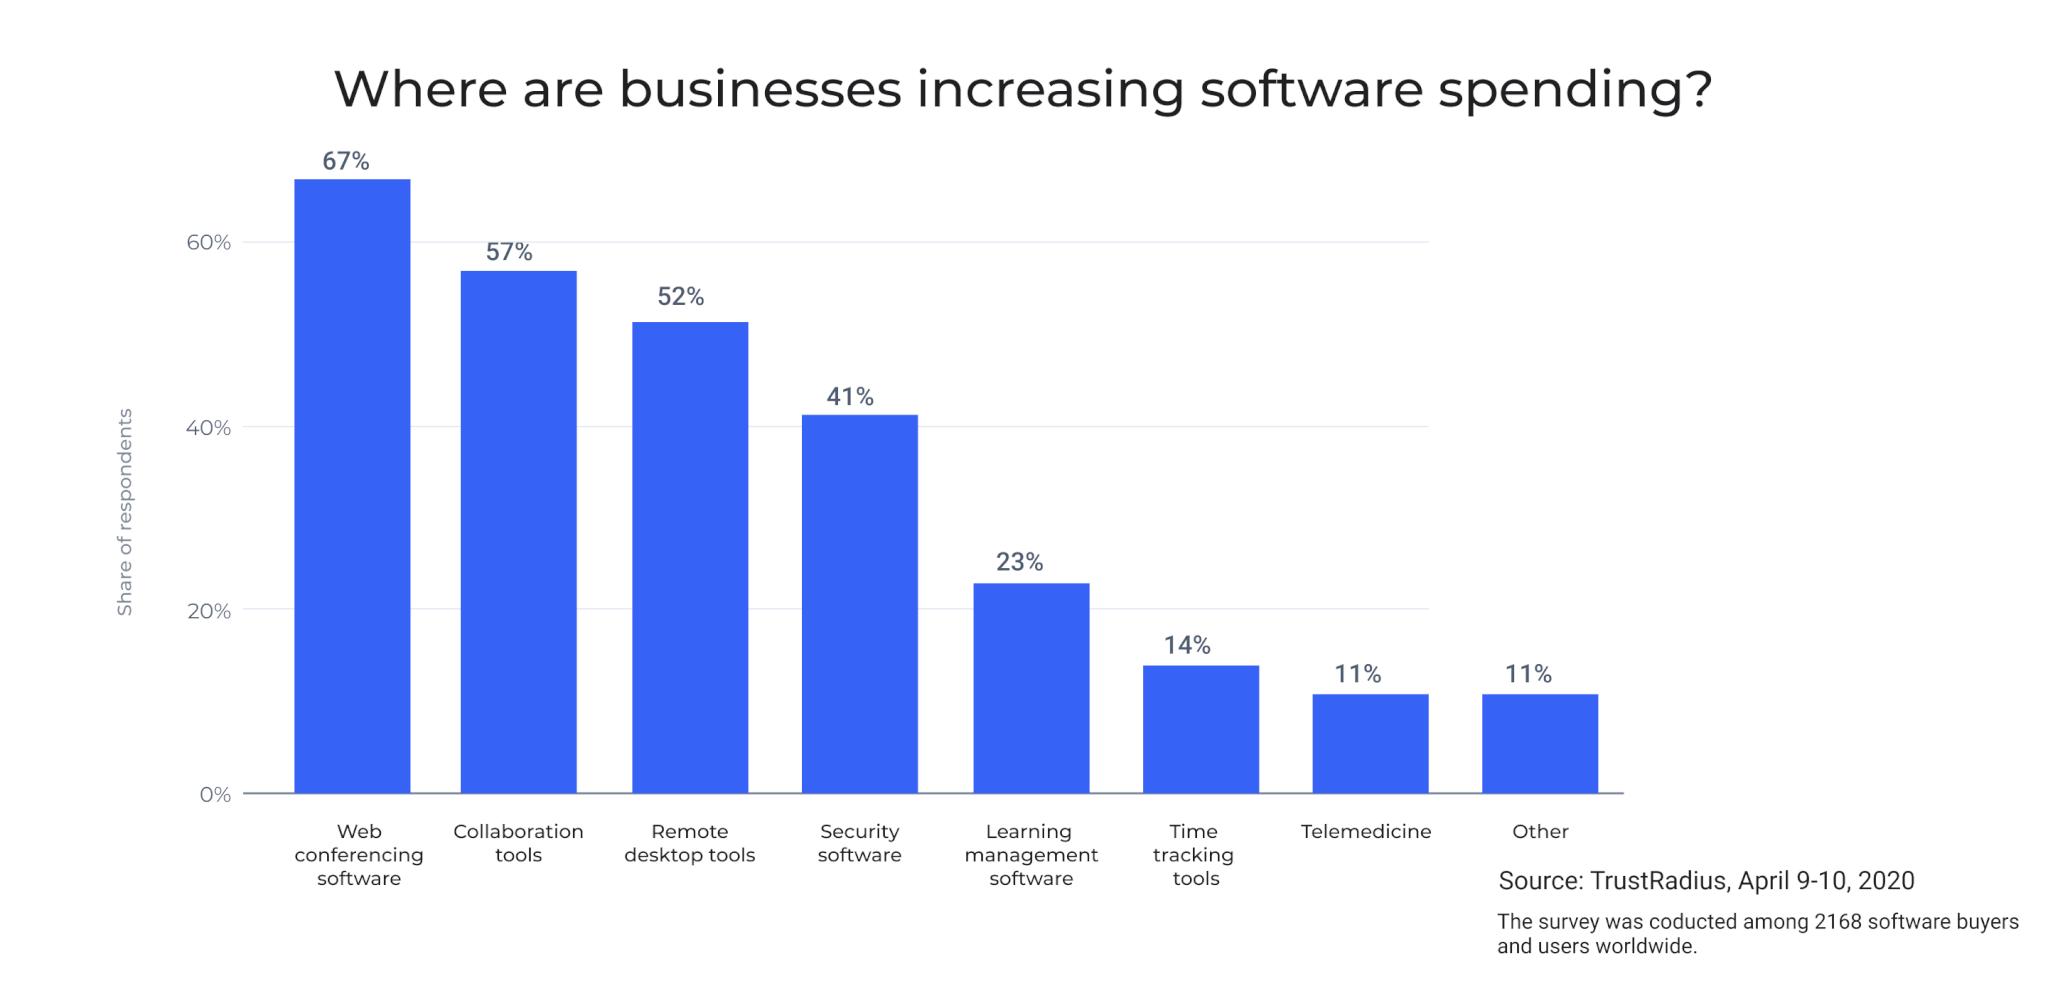 Businesses increasing software spending